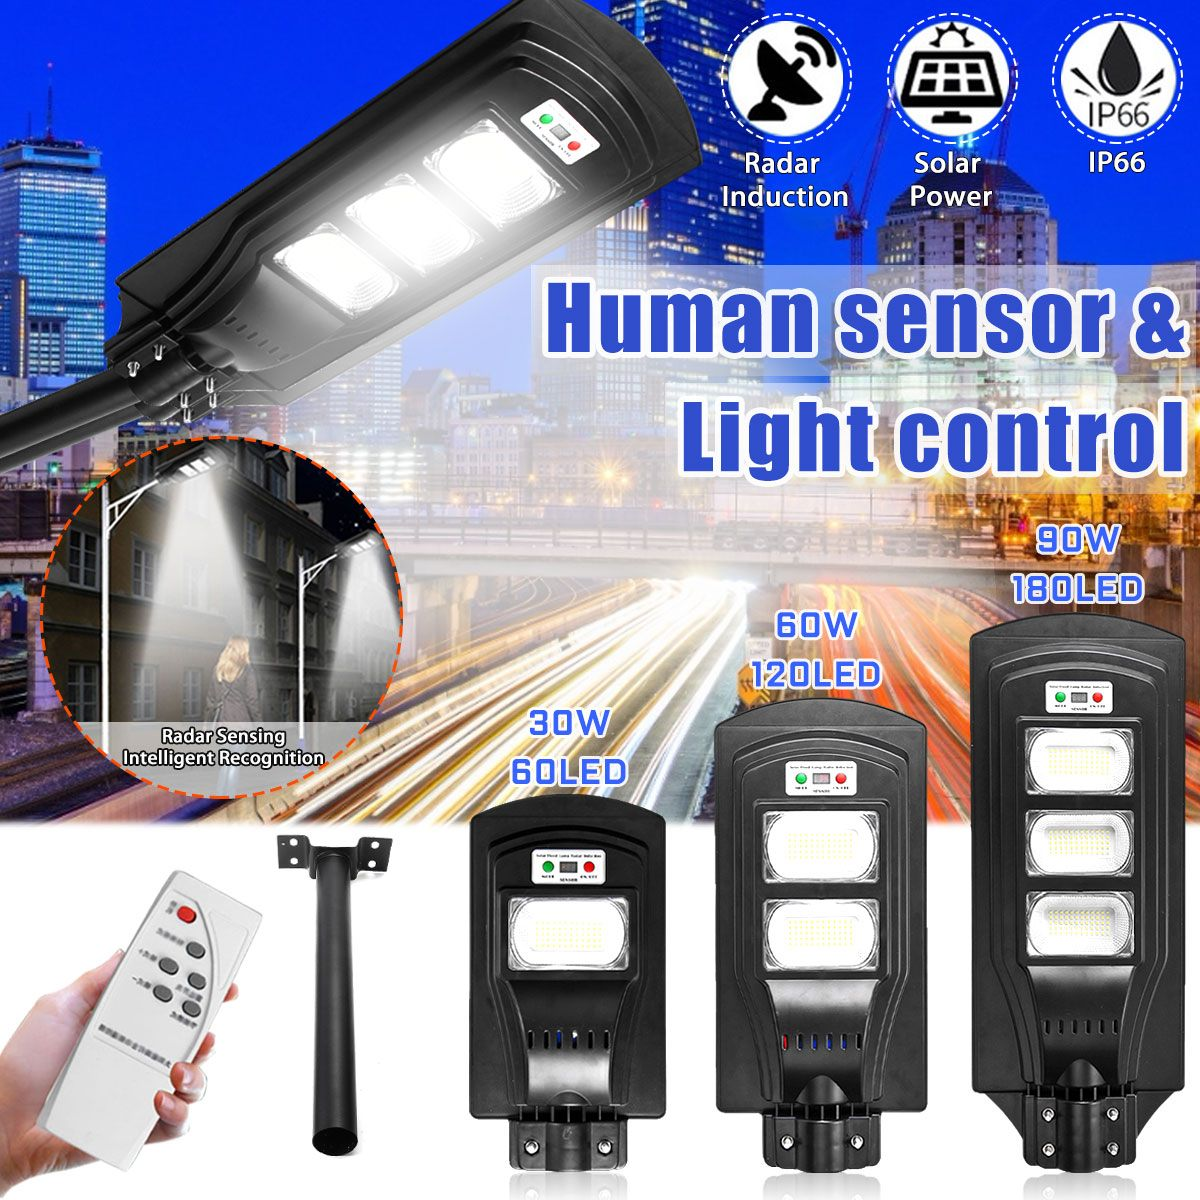 30/60/90W LED Wand Lampe IP66 led Solar Straße Licht Radar motion 2 In 1 Ständig helle induktion Solar Sensor Fernbedienung